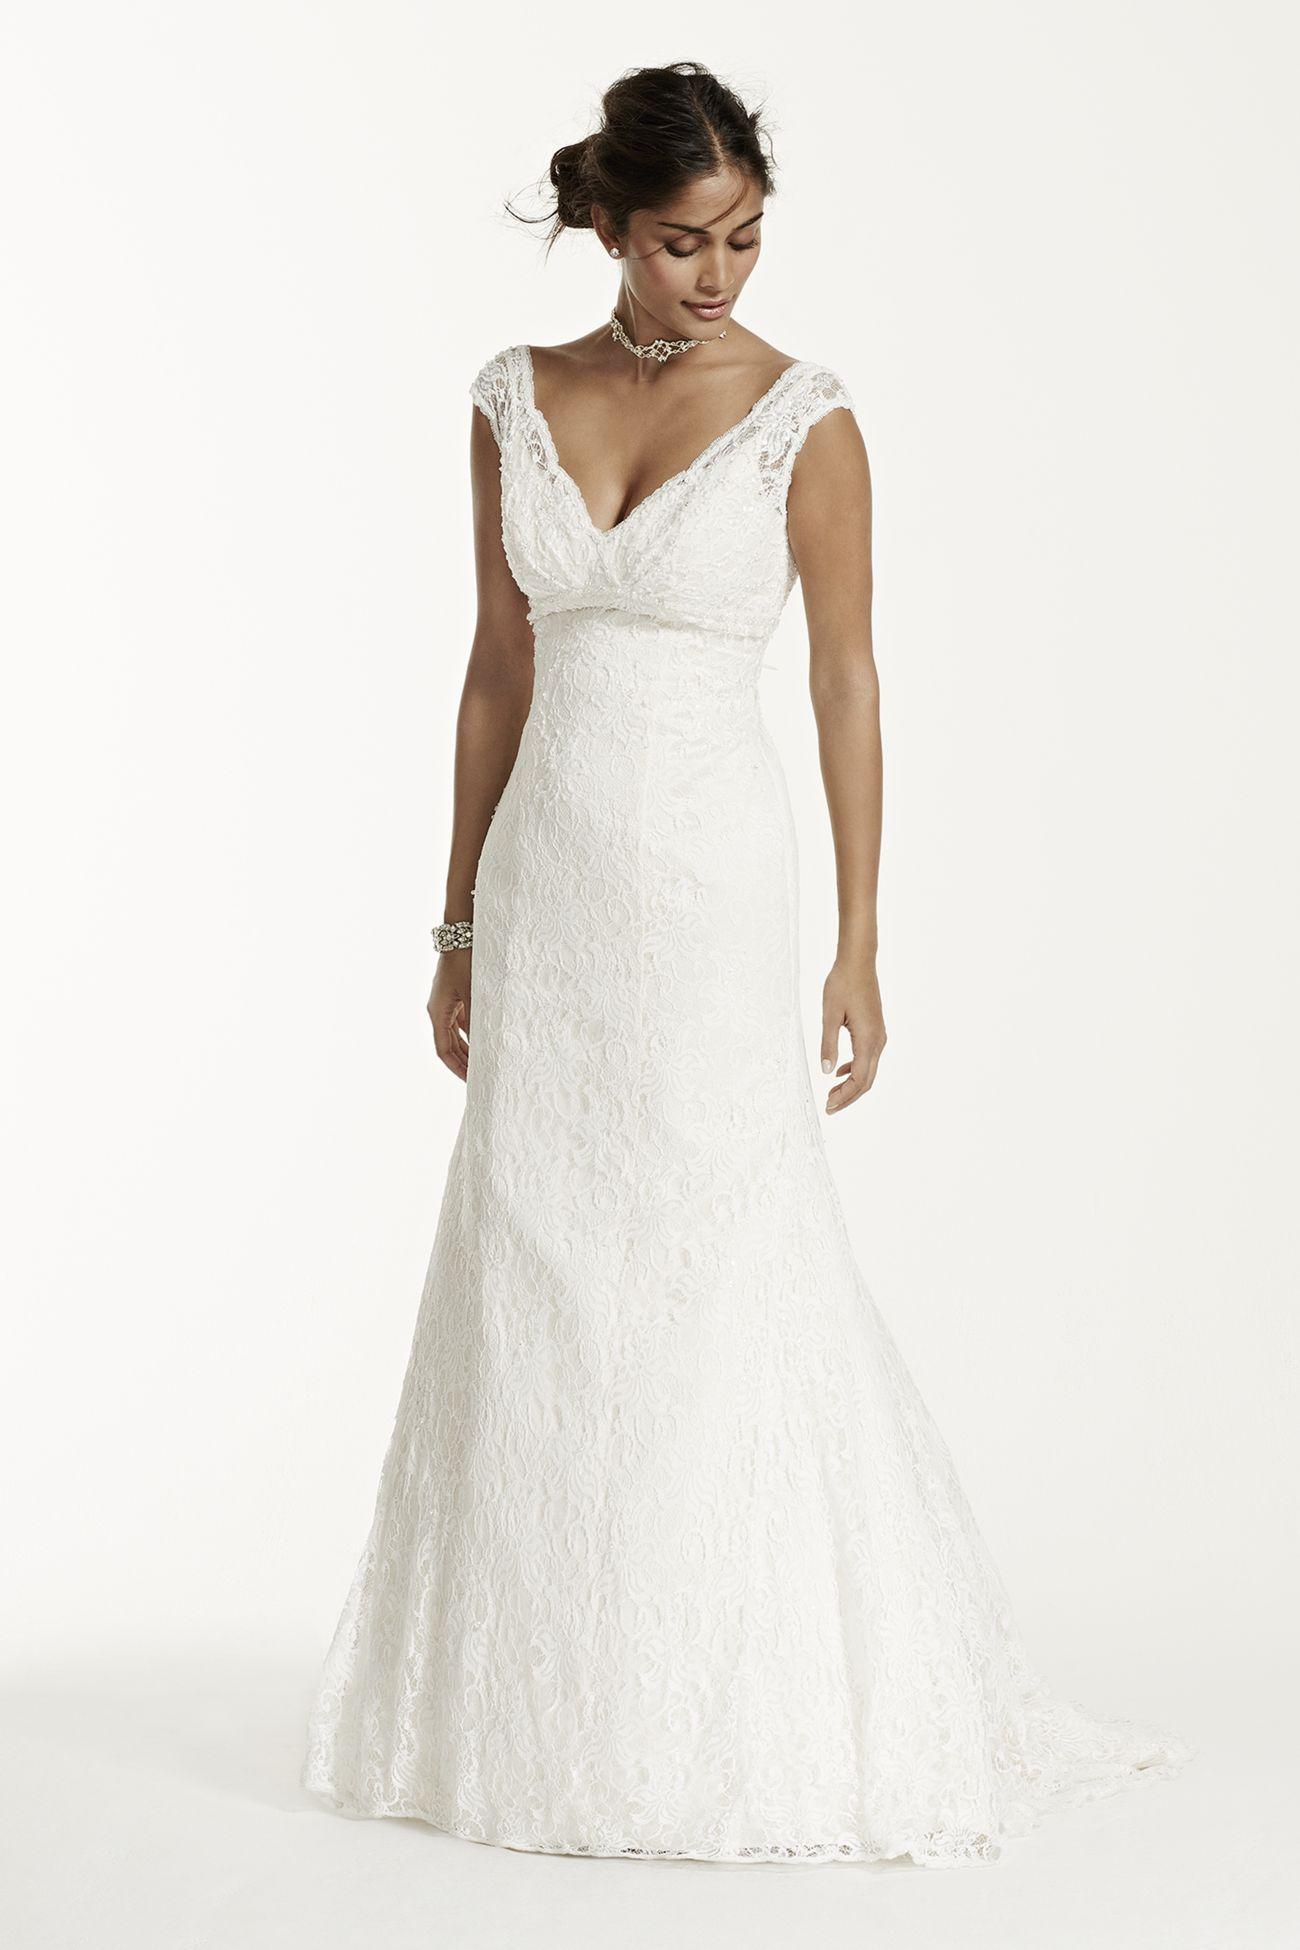 Rent wedding dress davids bridal  Pin by Aubree Coleman on Beautiful Dreams  Pinterest  Wedding